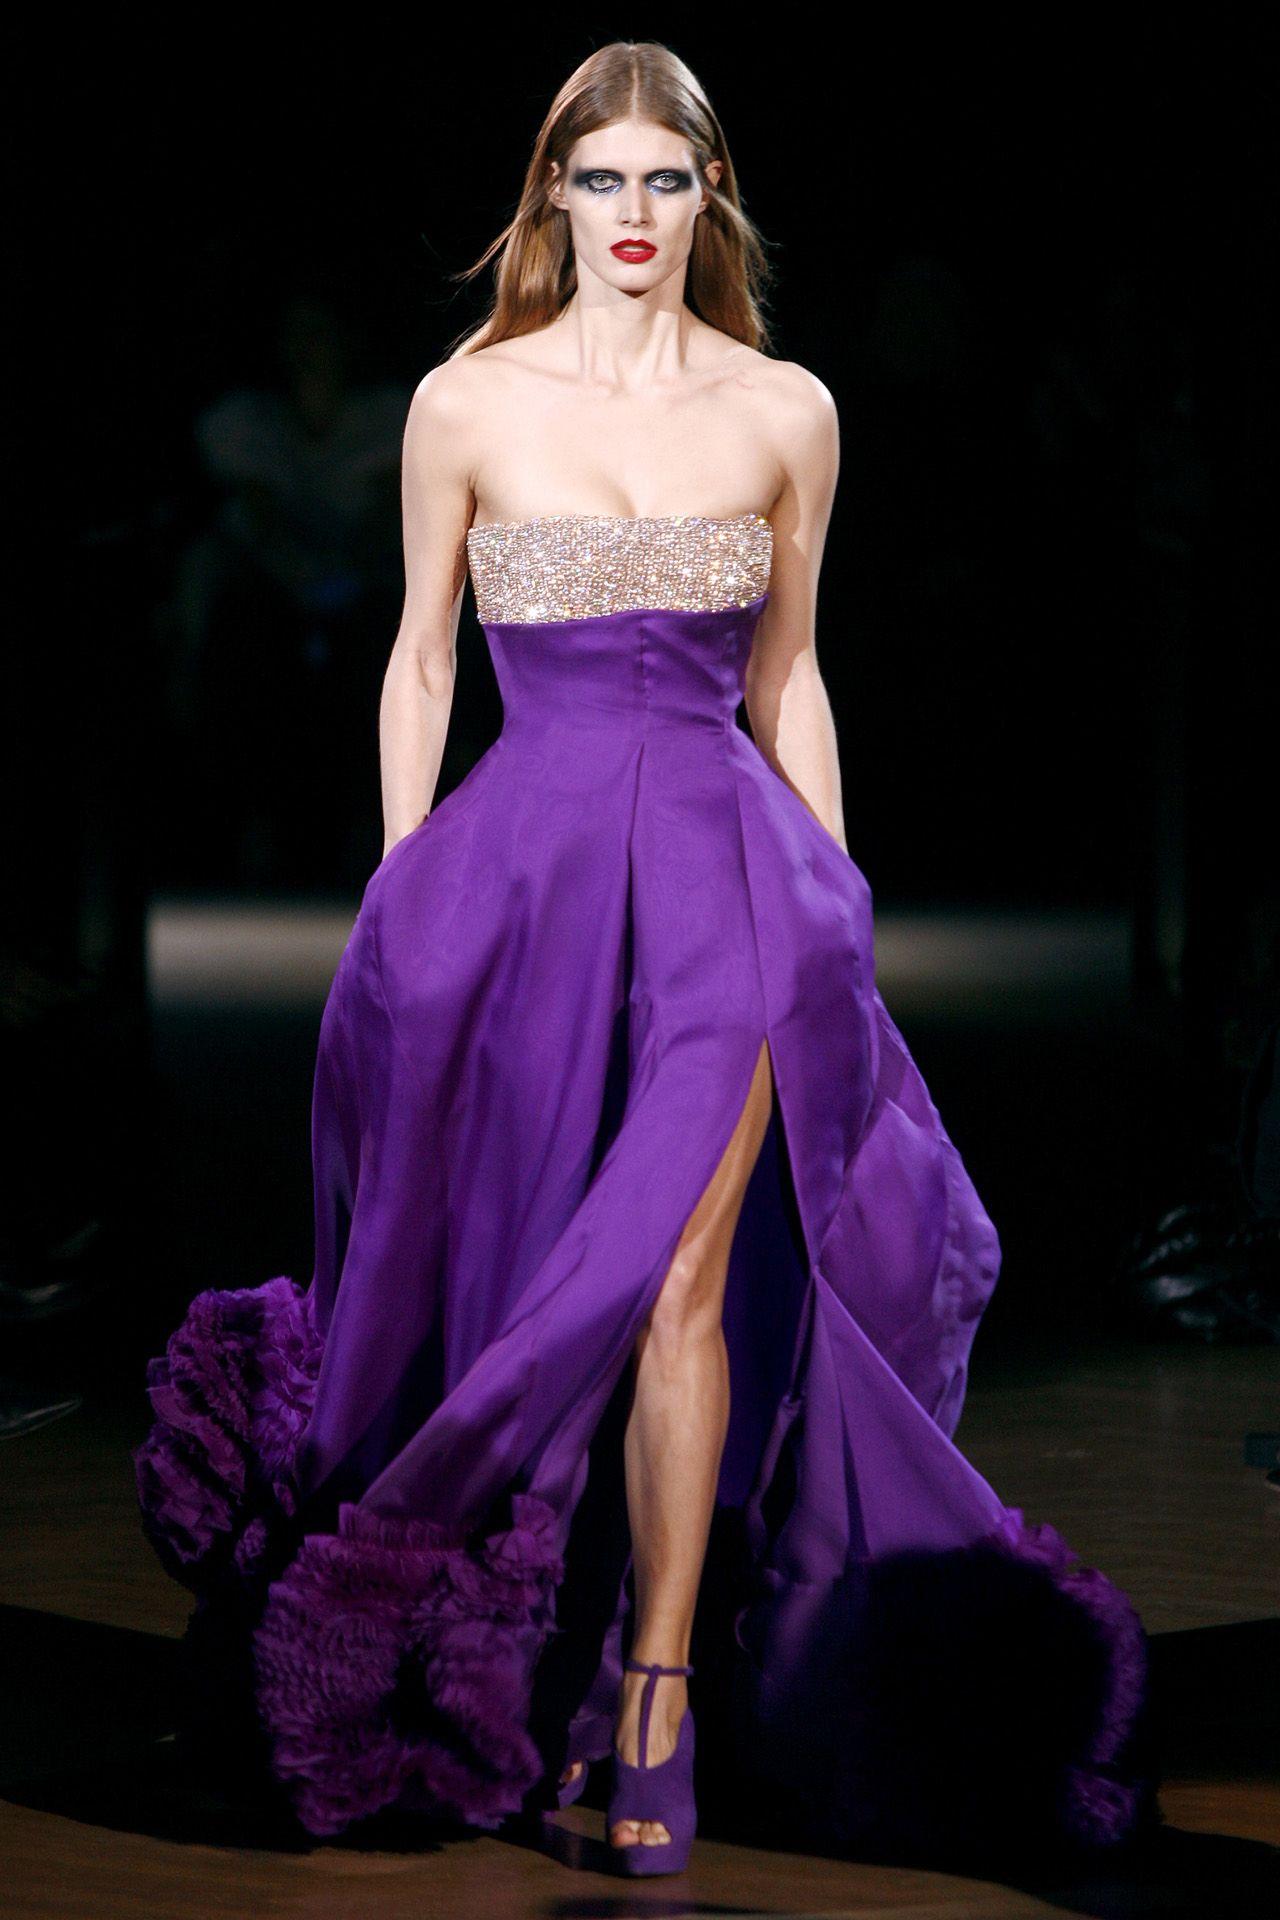 Pin by tanya on long bluepurple dresses pinterest purple dress